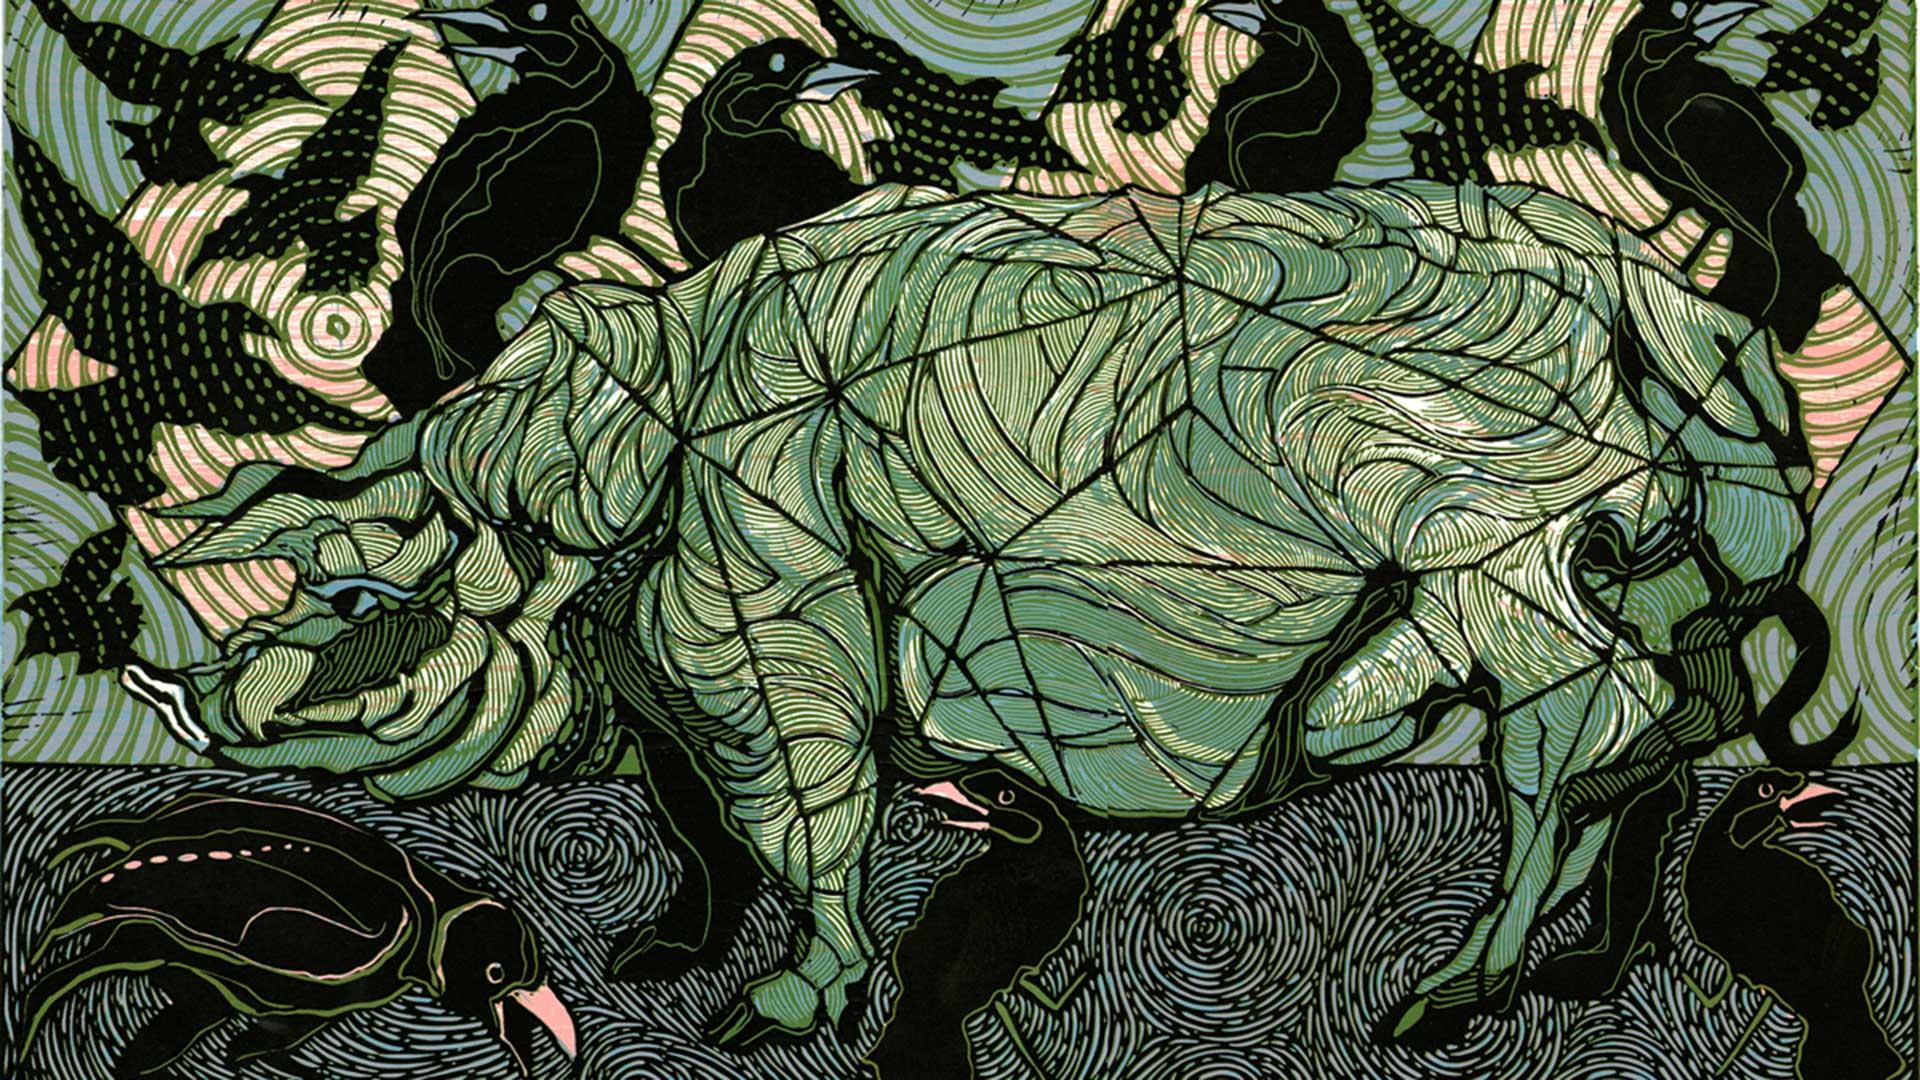 War Machine, Linocut/Woodcut by artist, Dale Clifford